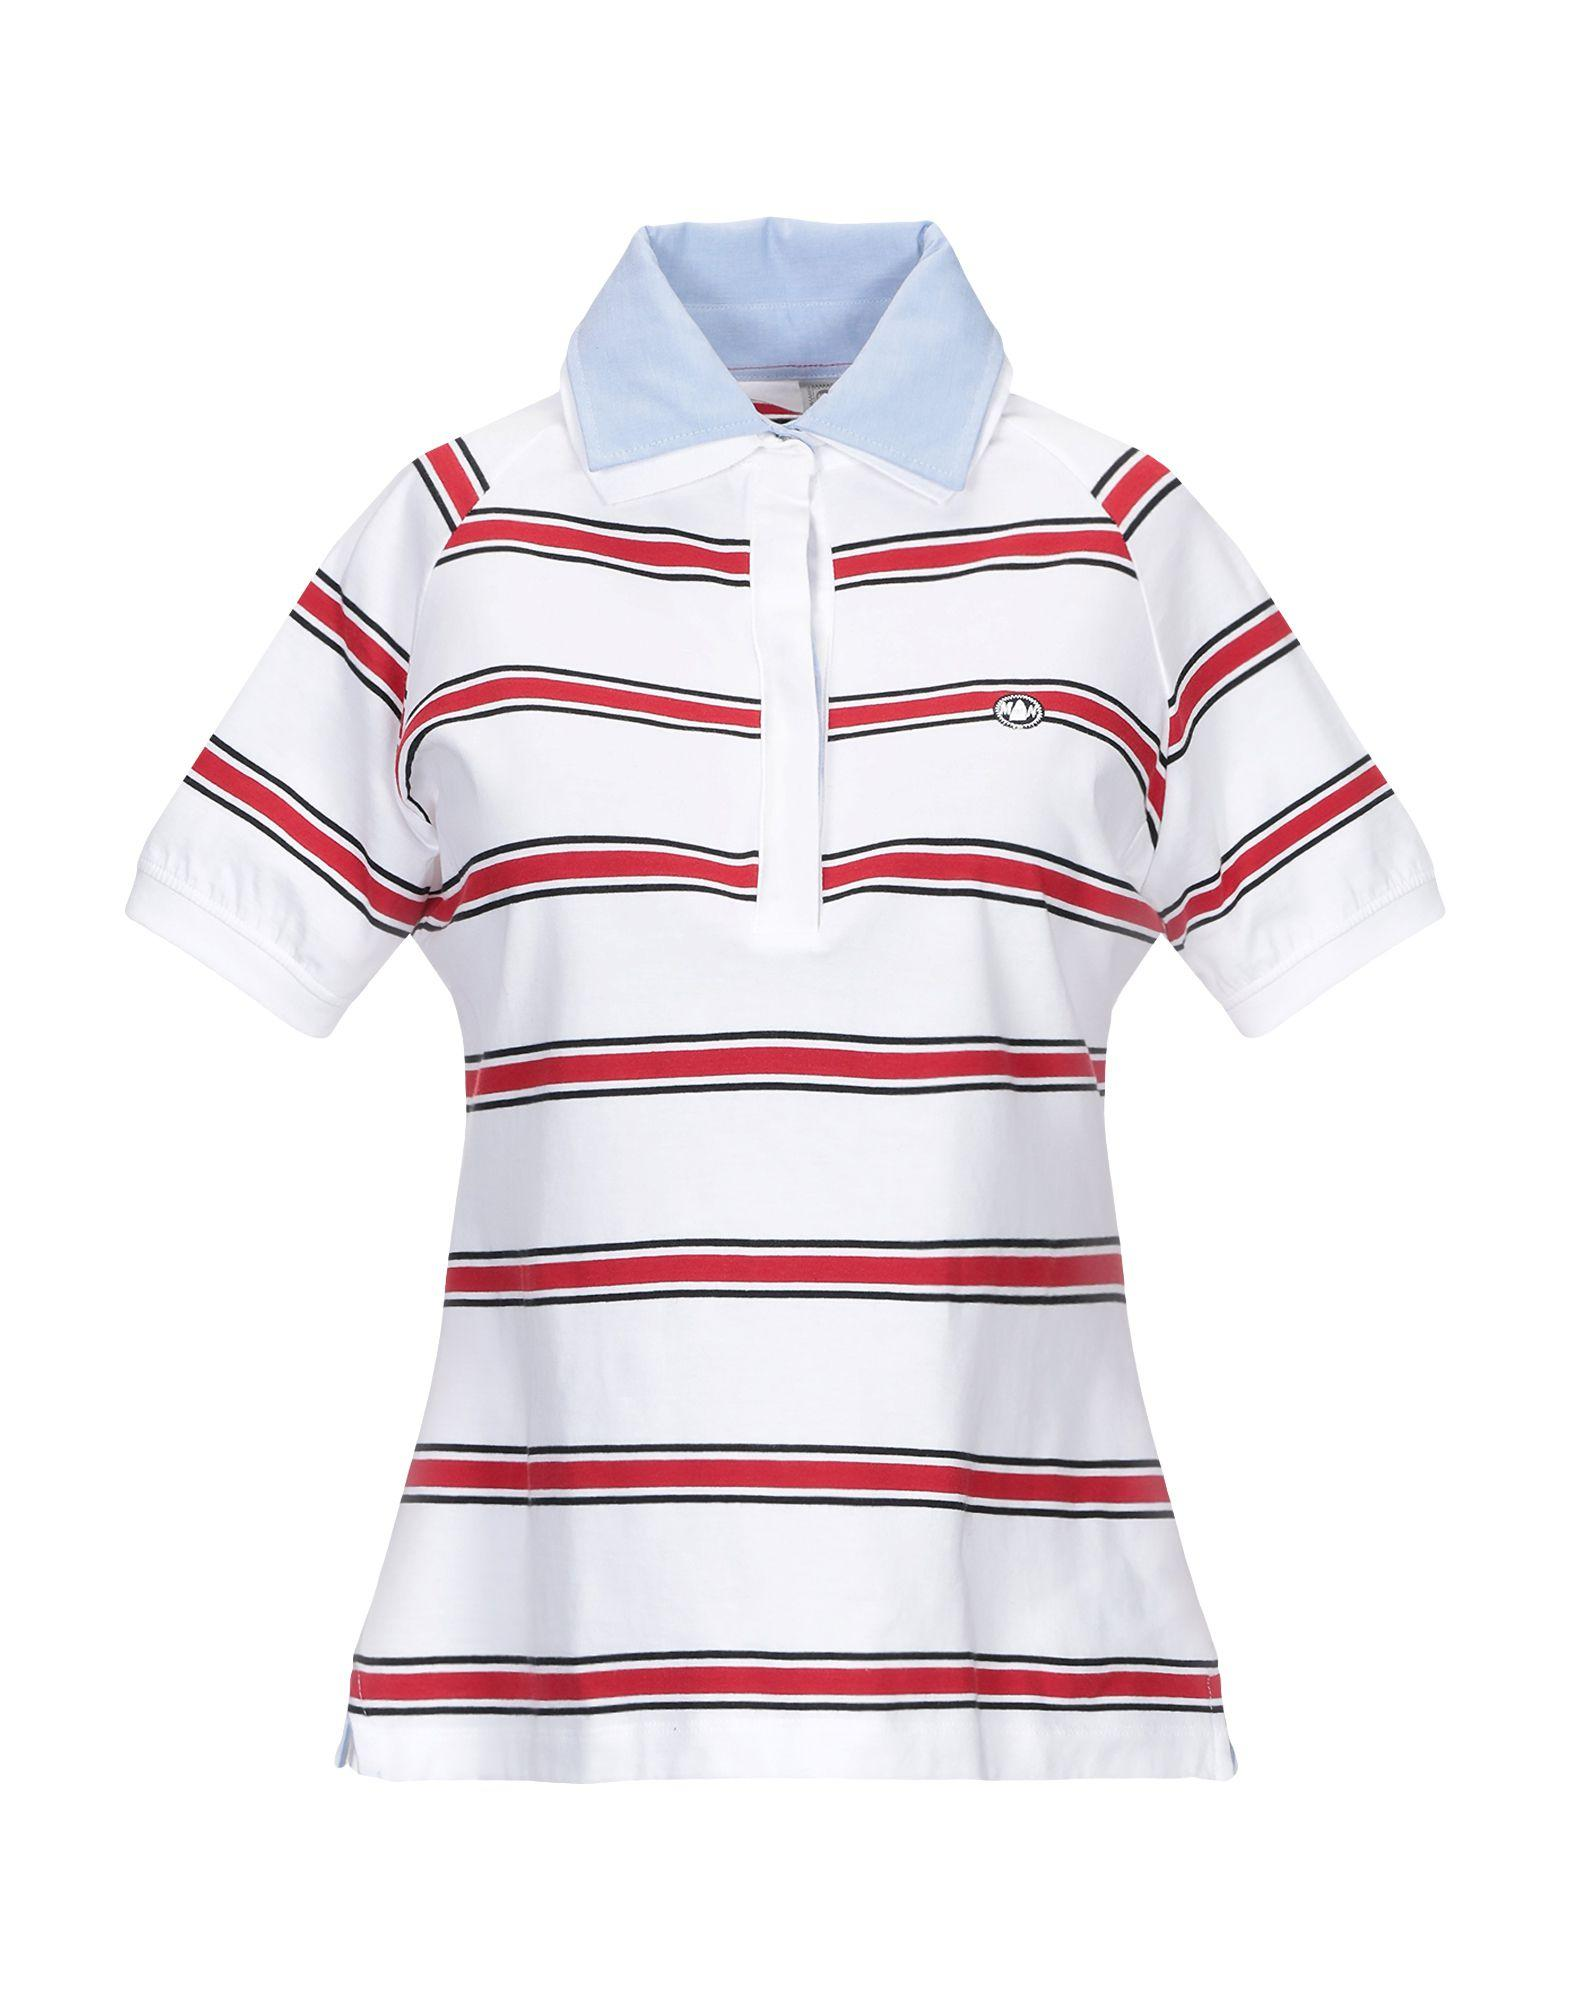 online store 64078 66eba Murphy & Nye Polo Shirt in White - Lyst